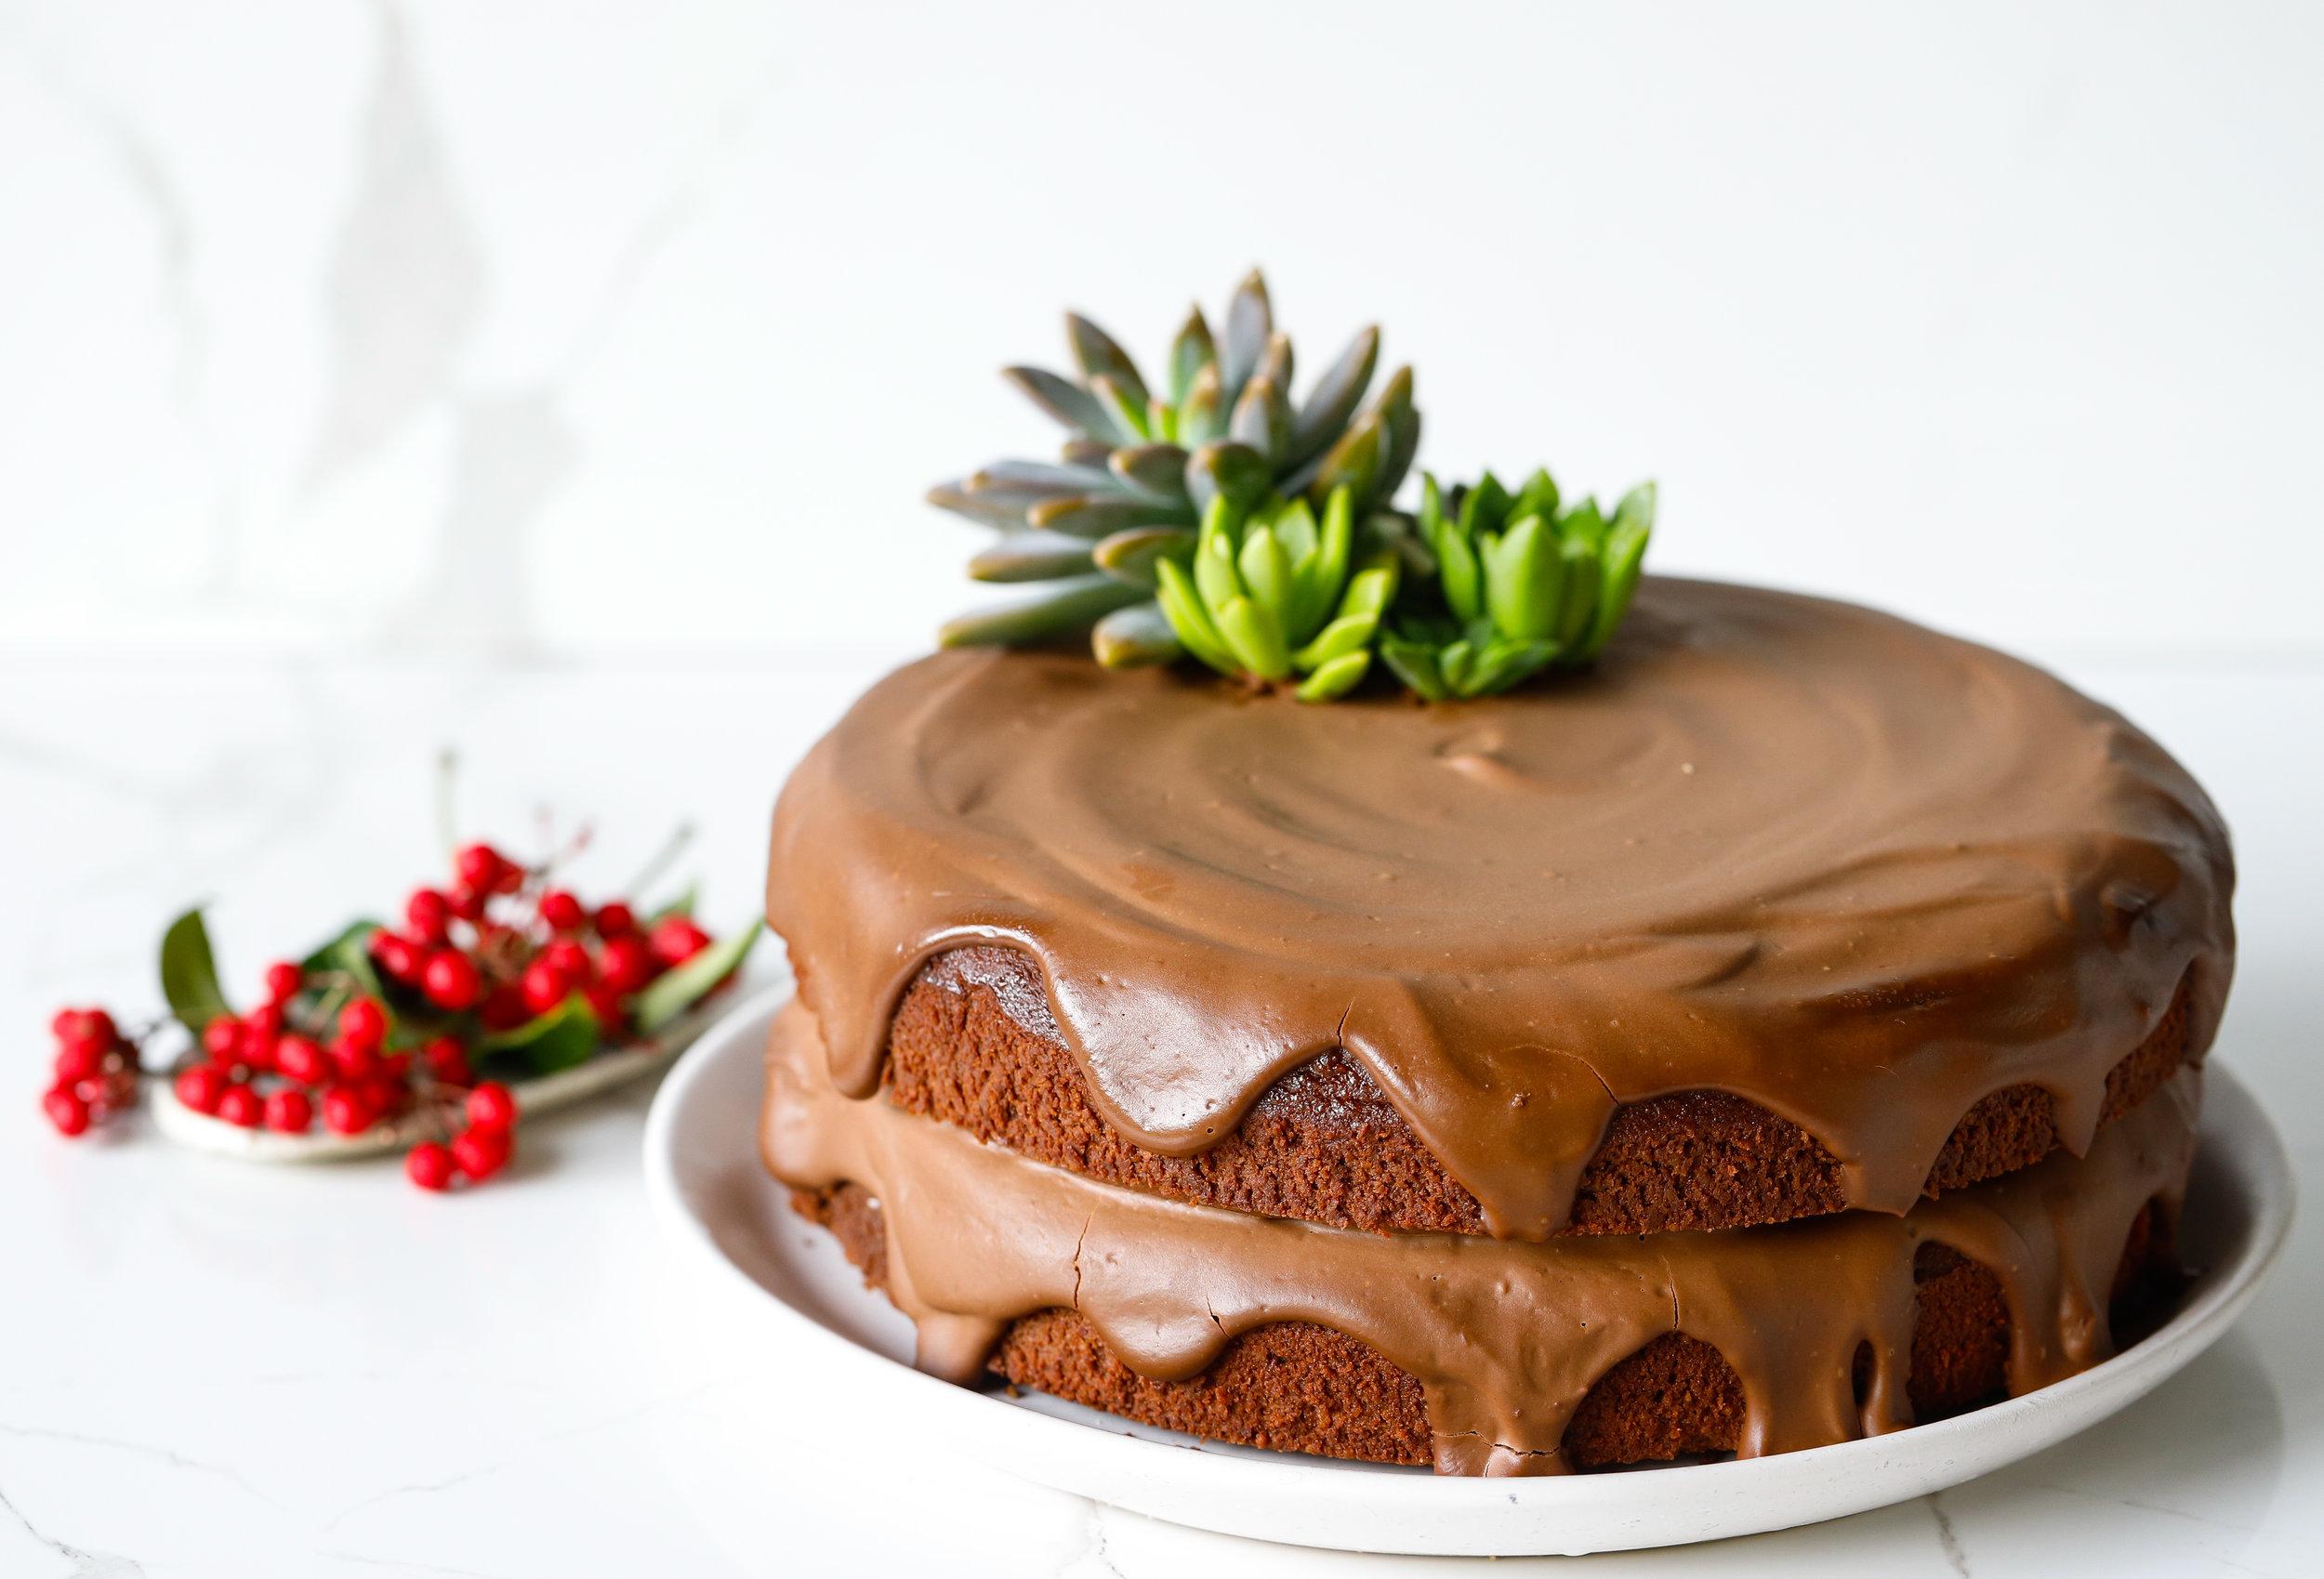 Incredibly_Decadent_Chocolate_Cake_3.jpg